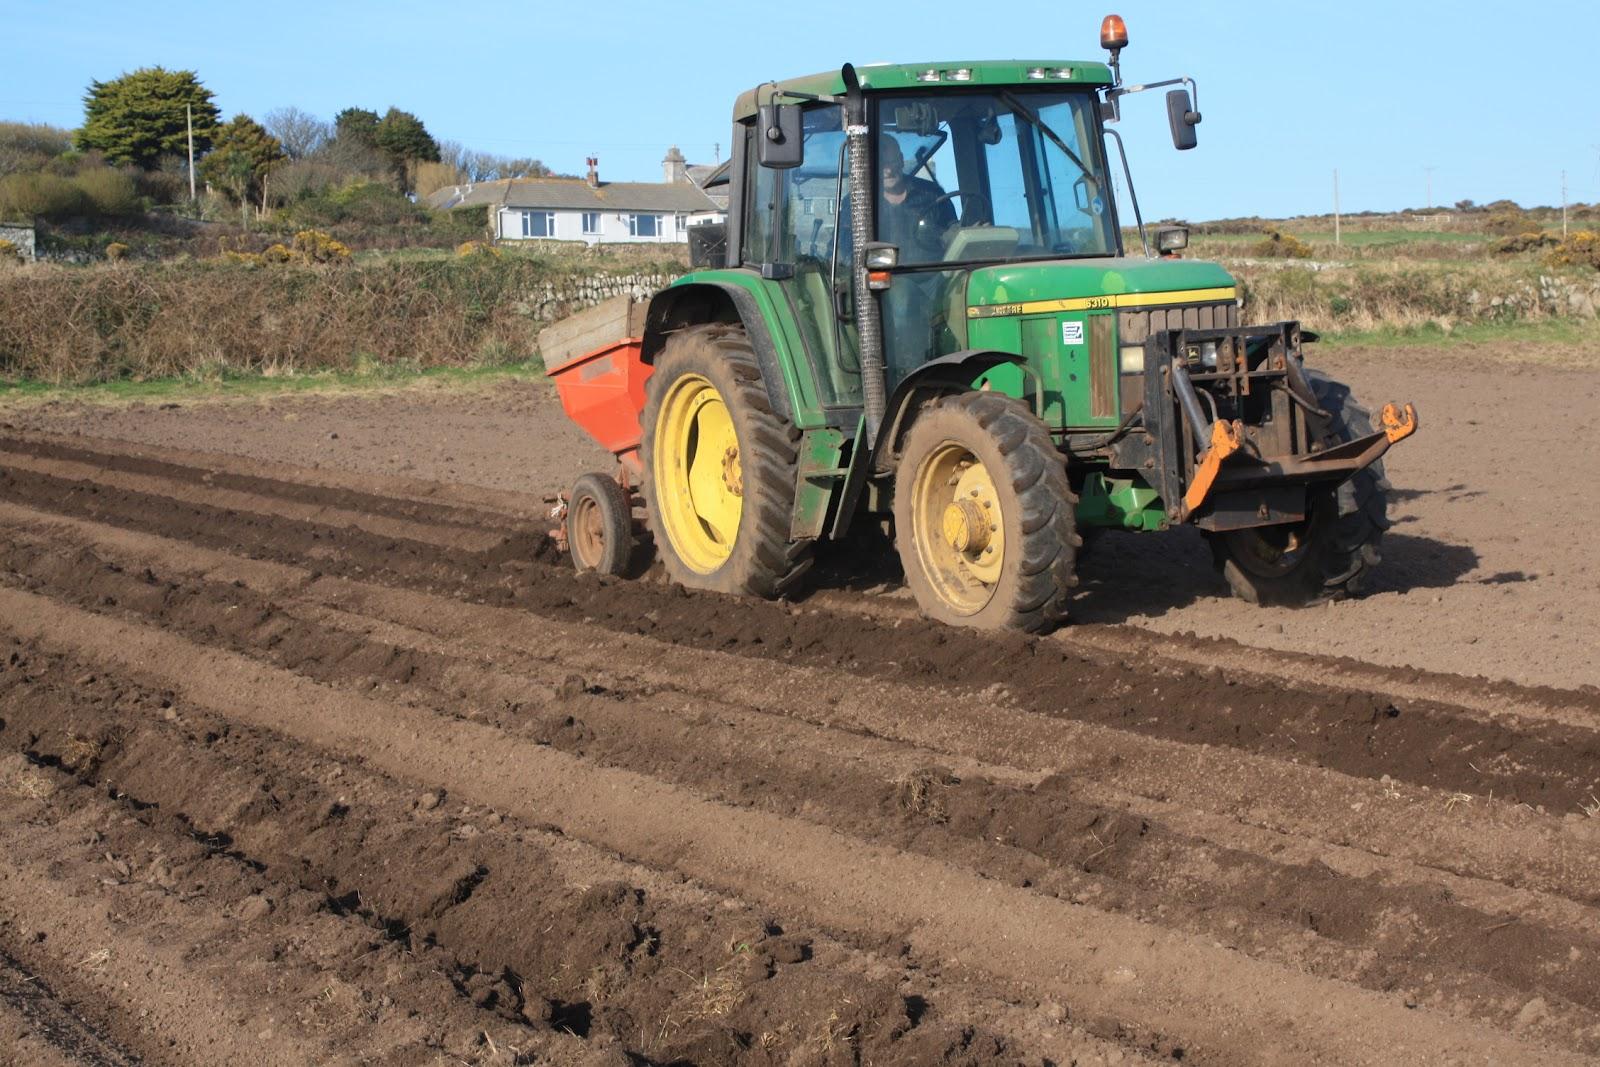 Tractor In Field Planting : Bosavern community farm maincrop field update